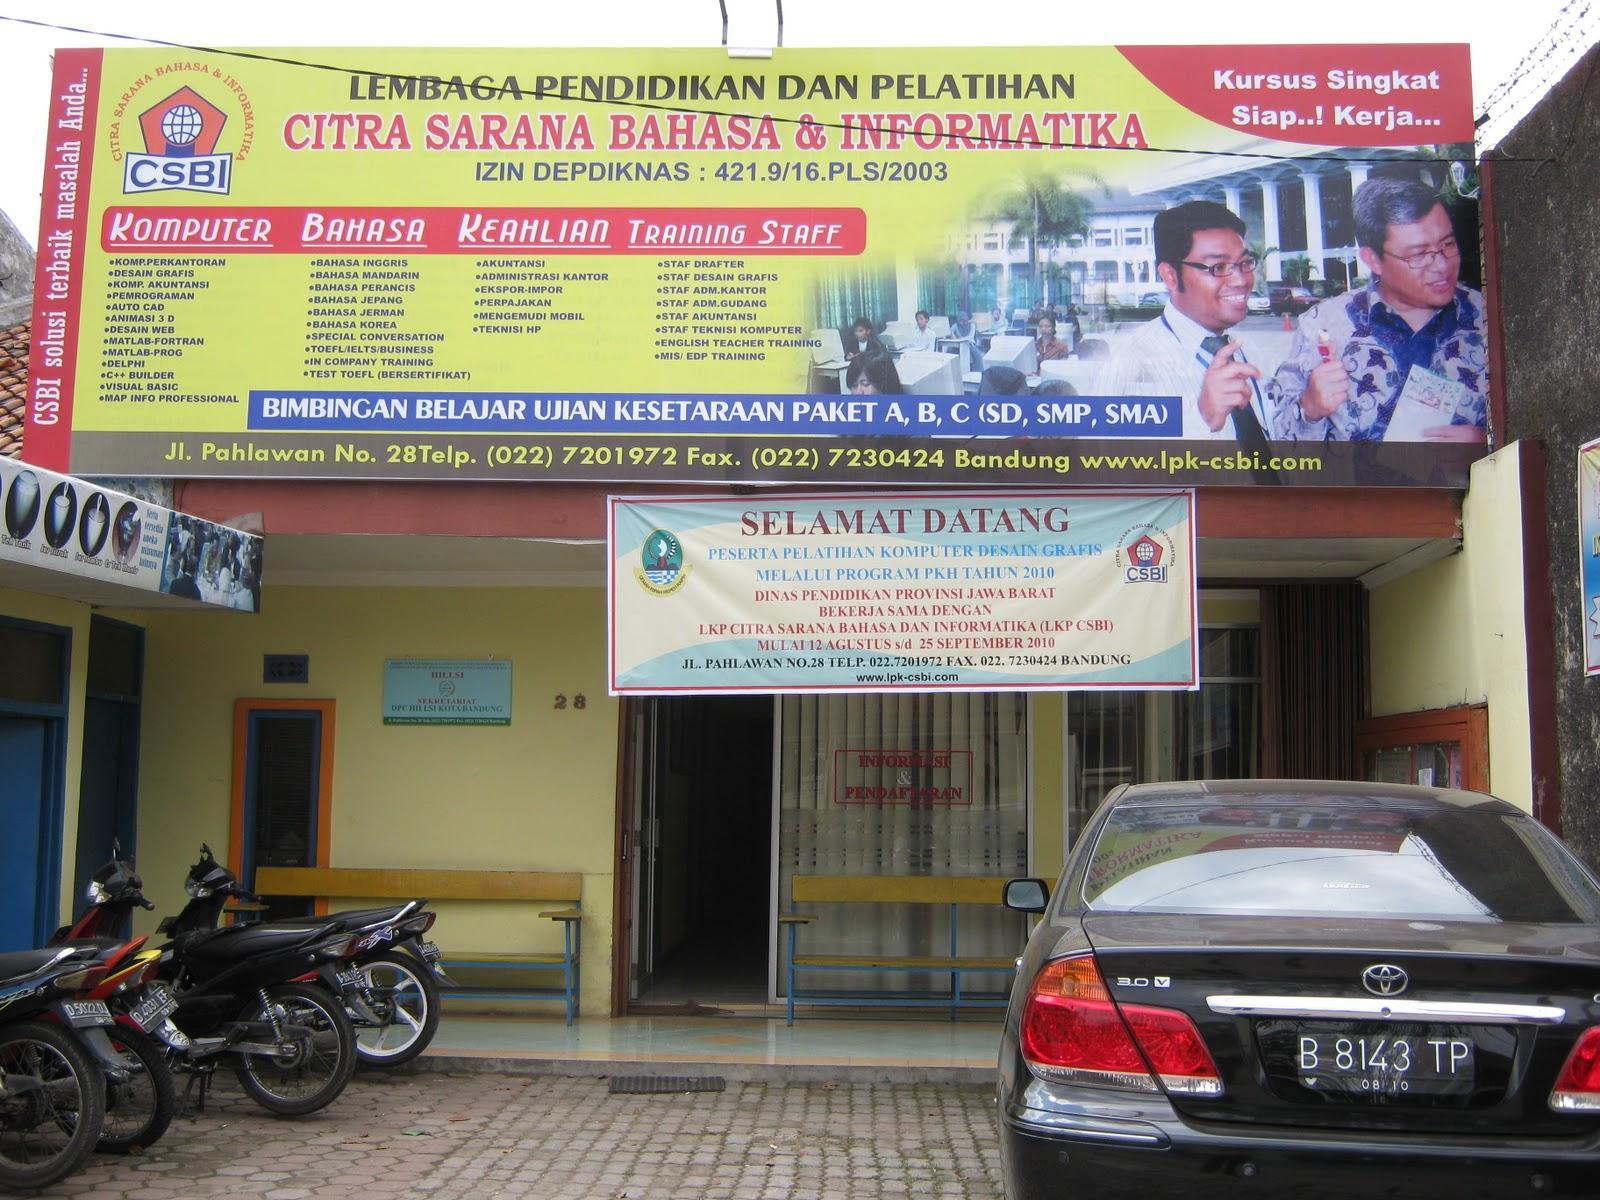 Daftar Tempat Kursus Komputer Di Bandung